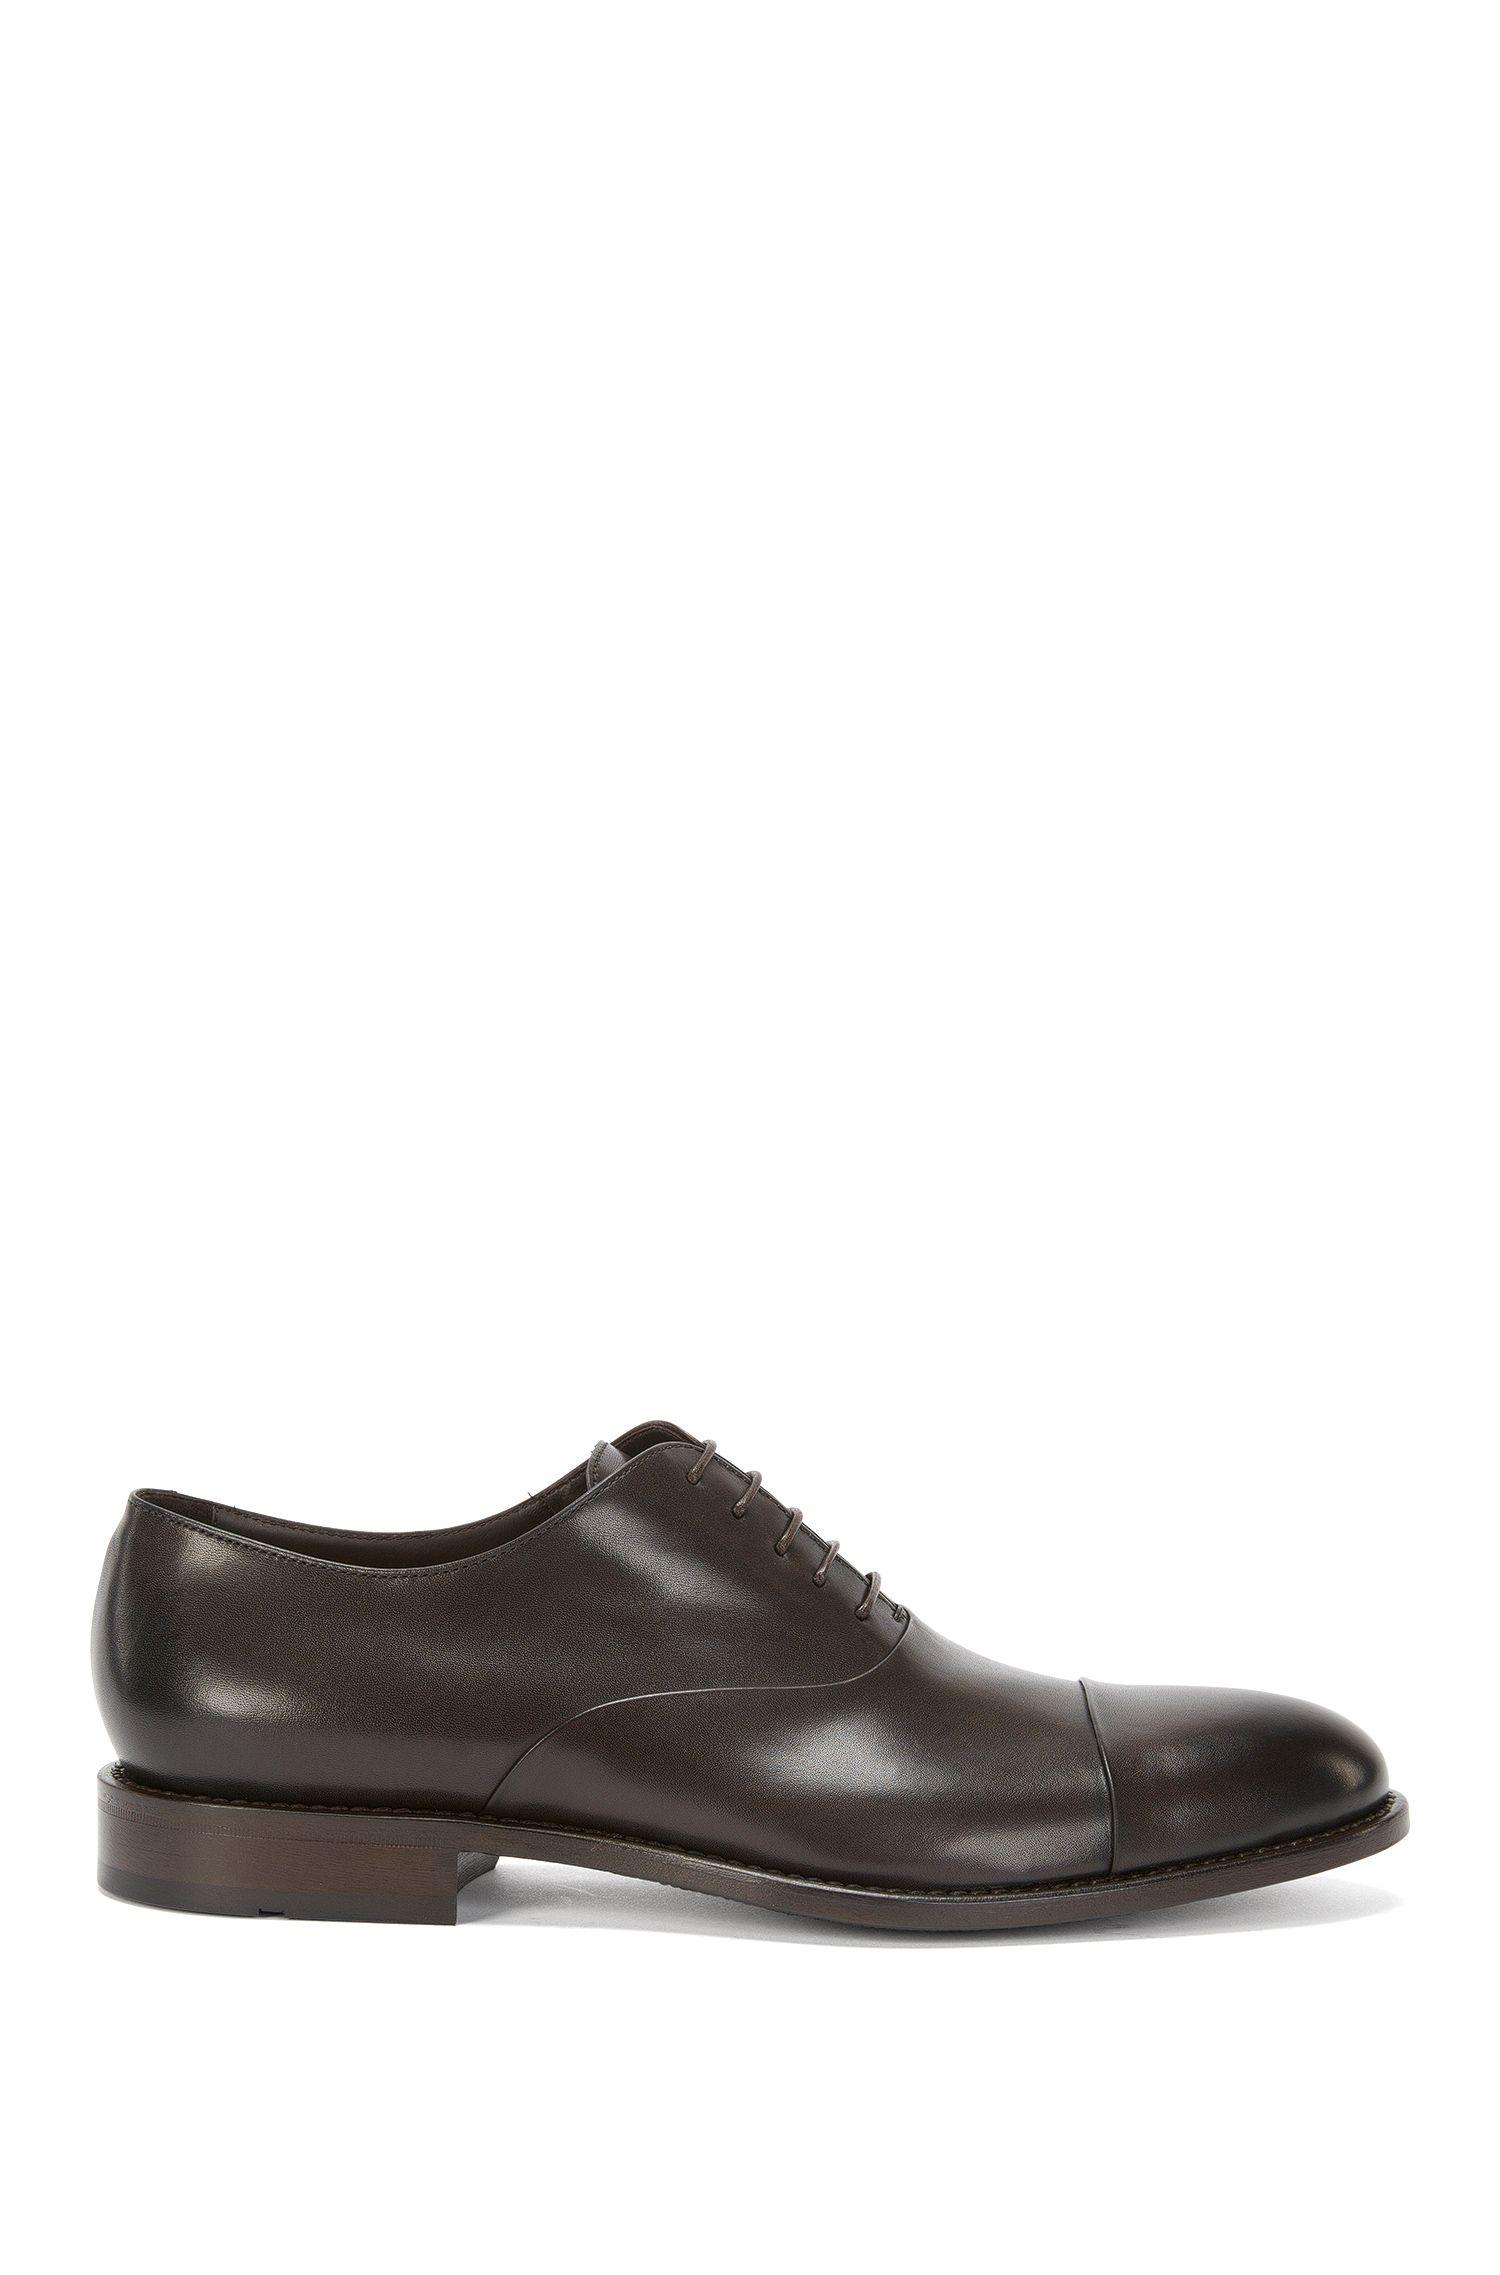 Italian Leather Oxford Dress Shoe | Stockholm Oxfr Ctst